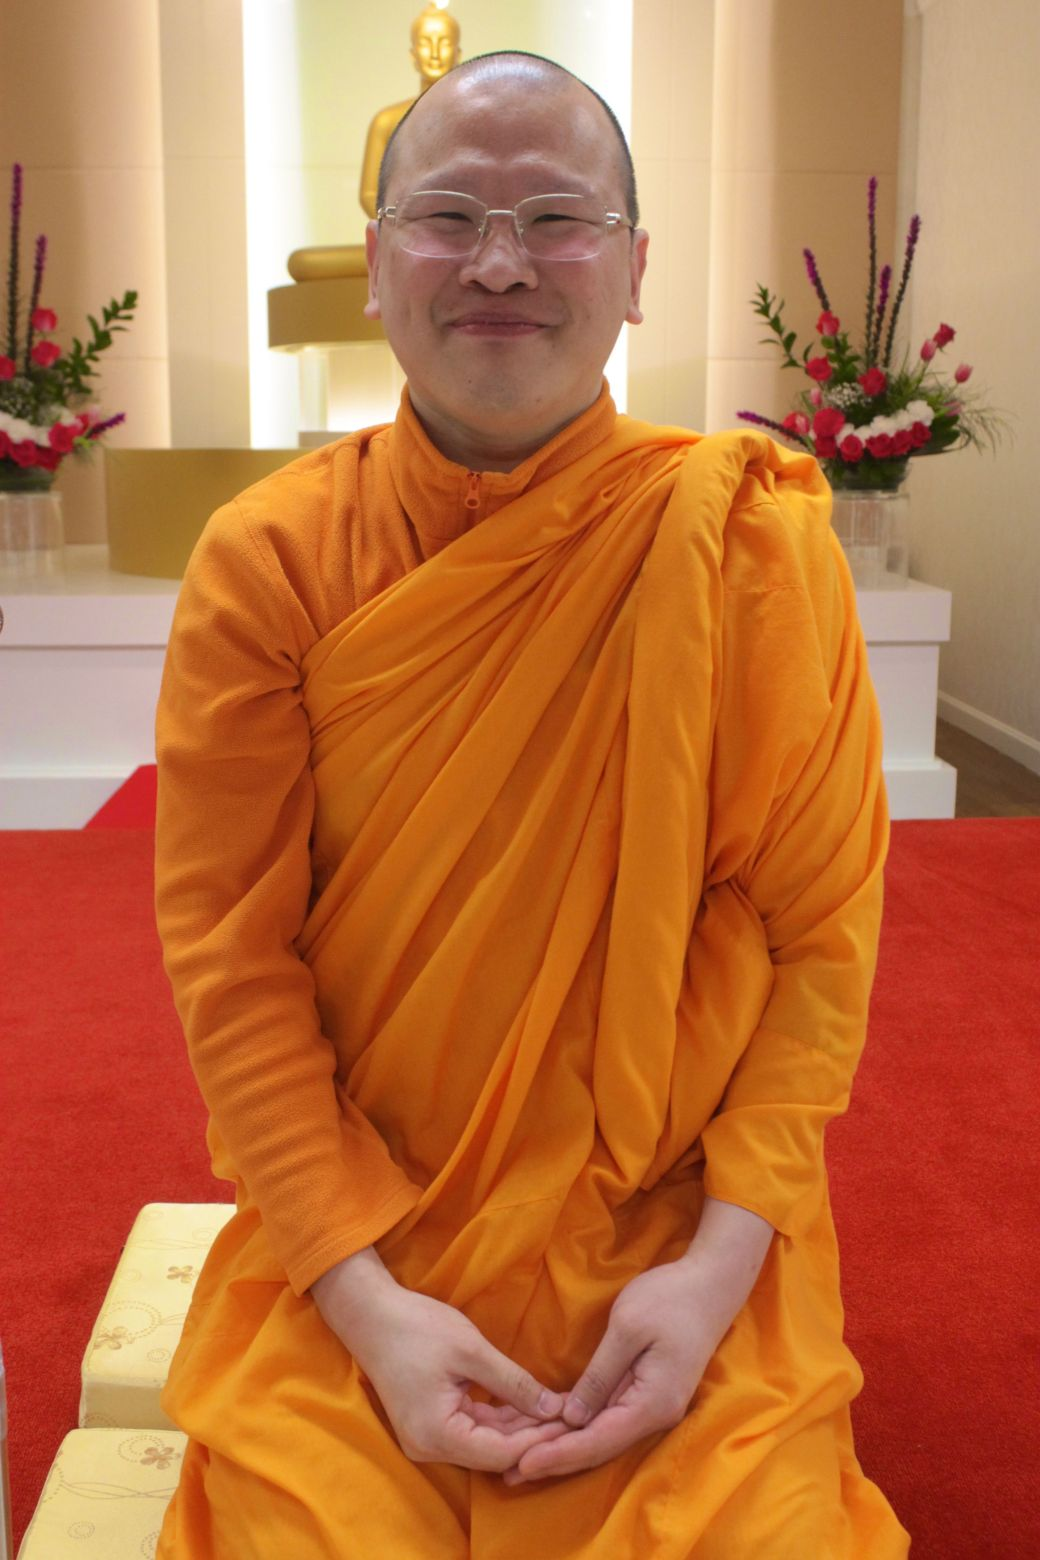 boston dhammakaya meditation center boston buddhist monk